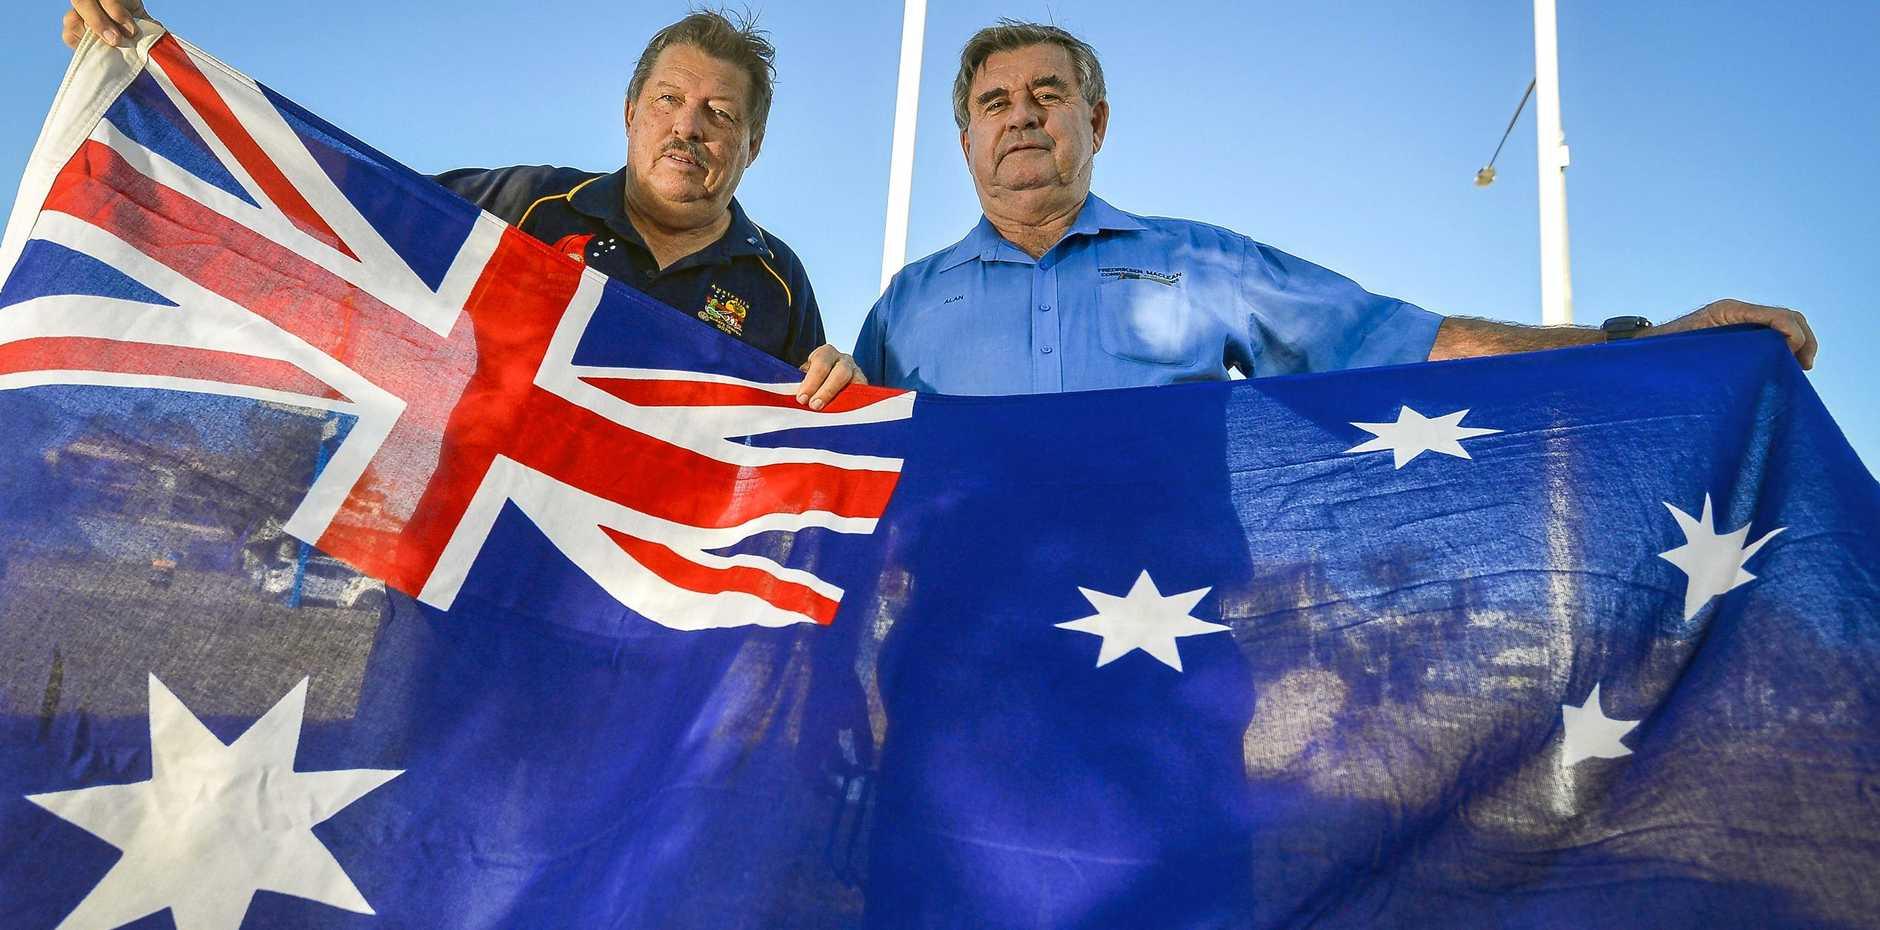 FLAG DAY: South Gladstone Rotary Club Flag Marshall Stephen Mills and South Gladstone Rotary Club president Alan Maclean.